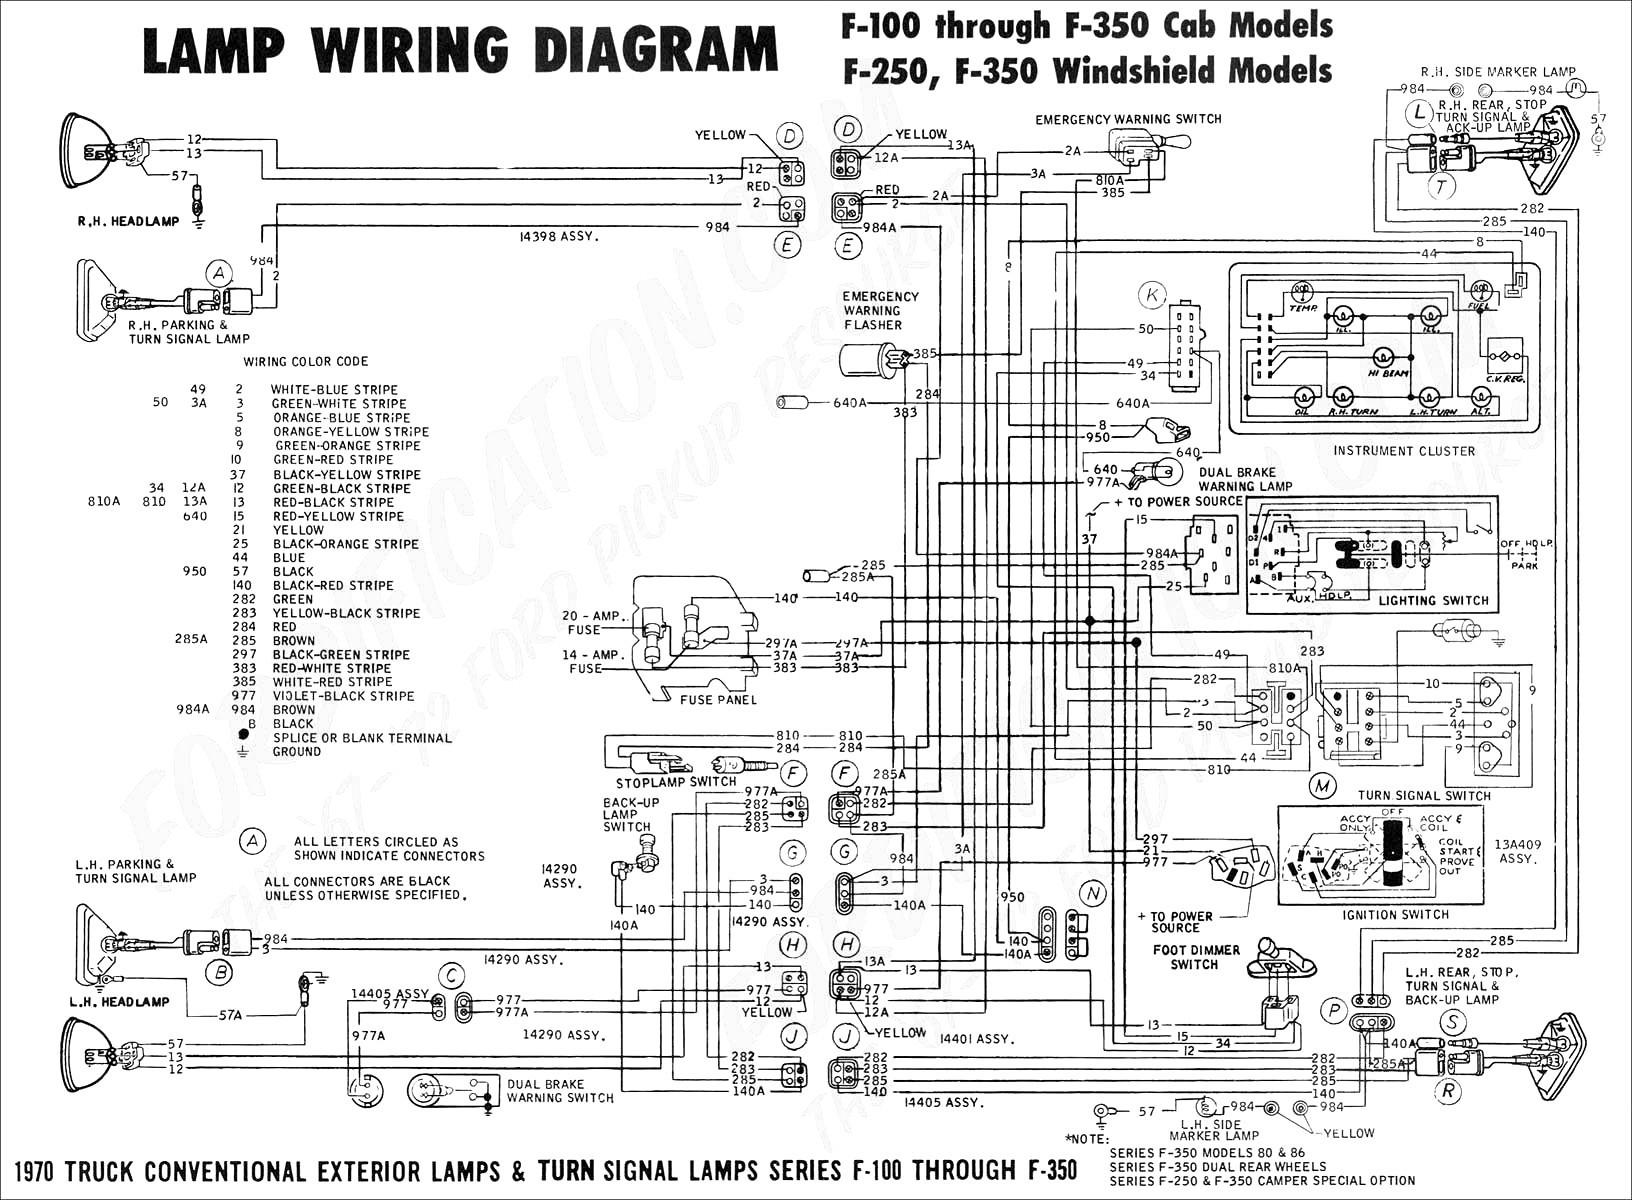 2002 ford Taurus Wiring Diagram 2001 ford Taurus Stereo ...  Ford Taurus Wiring Diagrams on